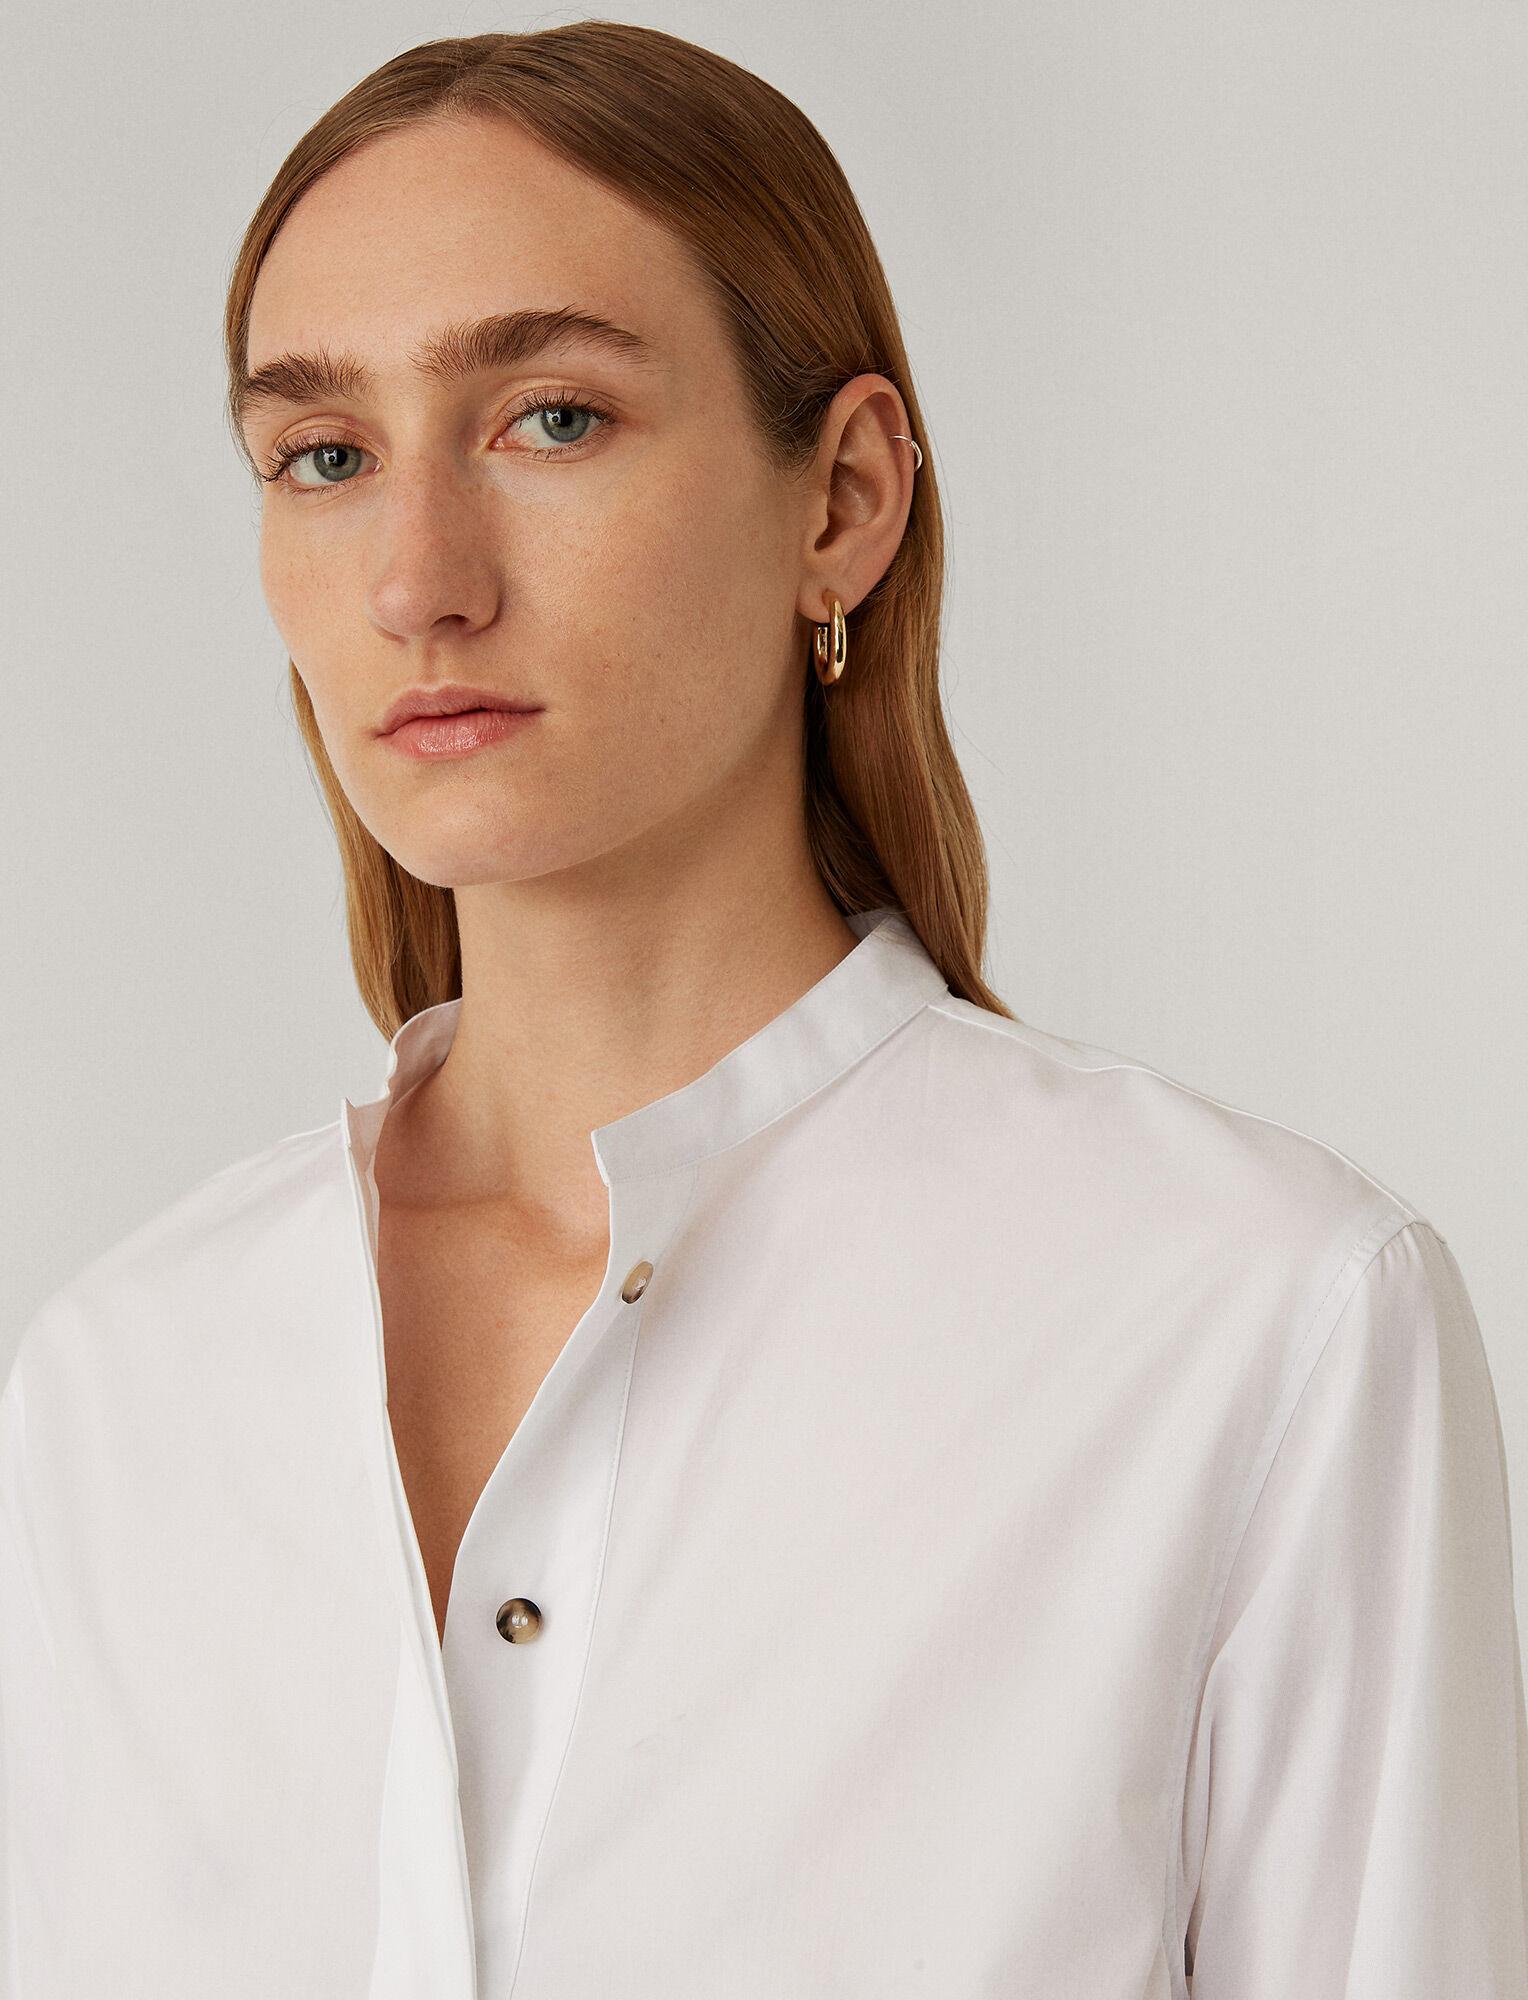 Joseph, Aufray Light Poplin Shirt, in WHITE